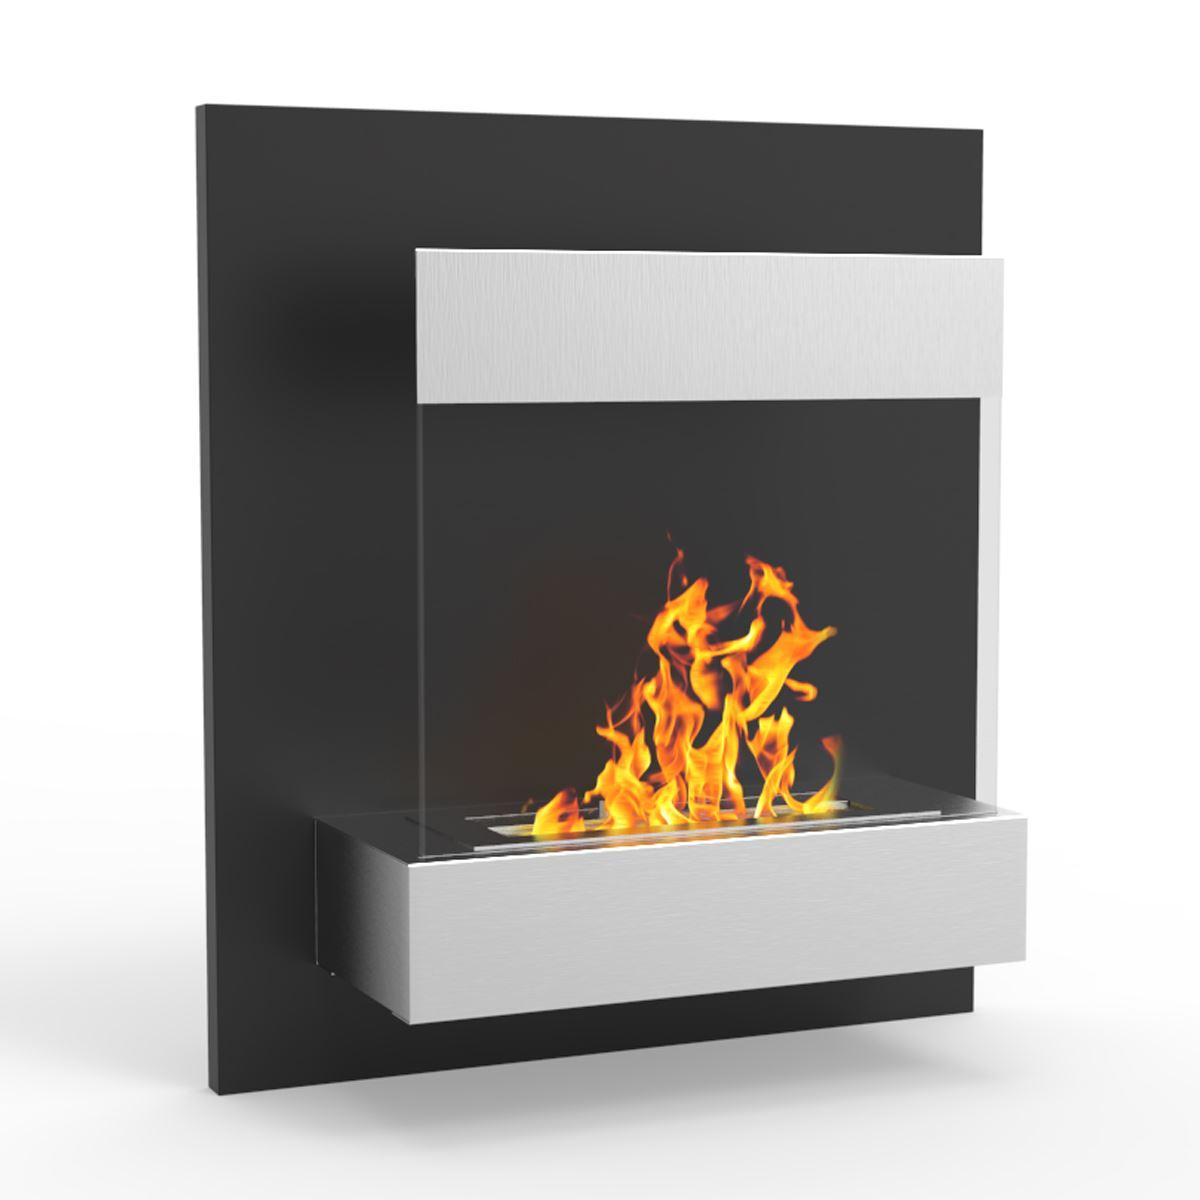 Regal Flame EW9001 Boston 24in Ventless Wall Mounted Bio Ethanol Fireplace